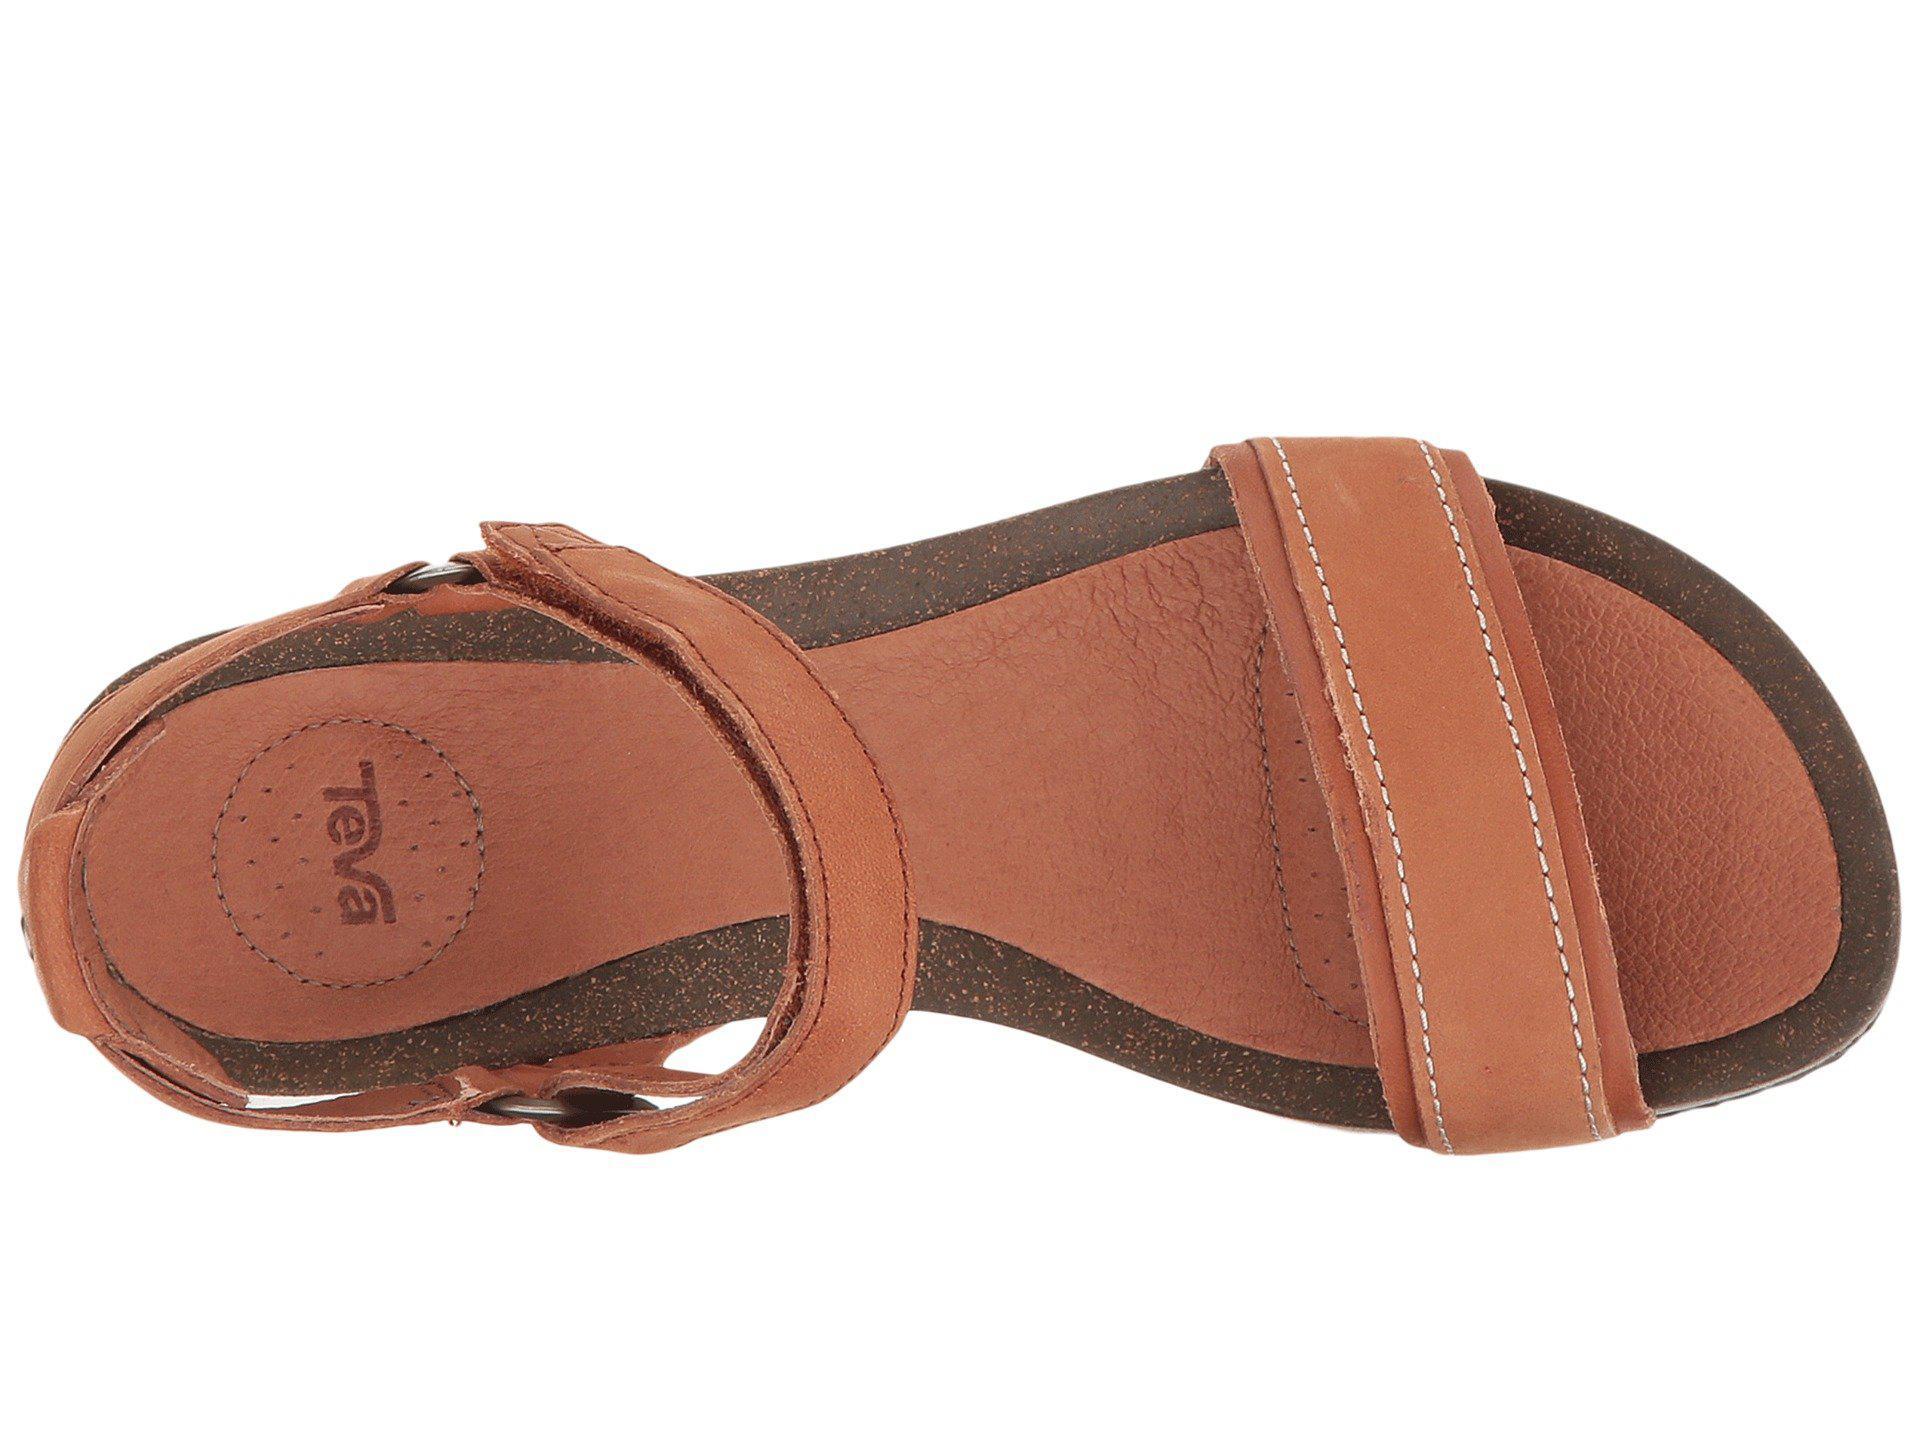 ec1f8bf20b33 Teva - Brown Ysidro Stitch Wedge Sandals - Lyst. View fullscreen